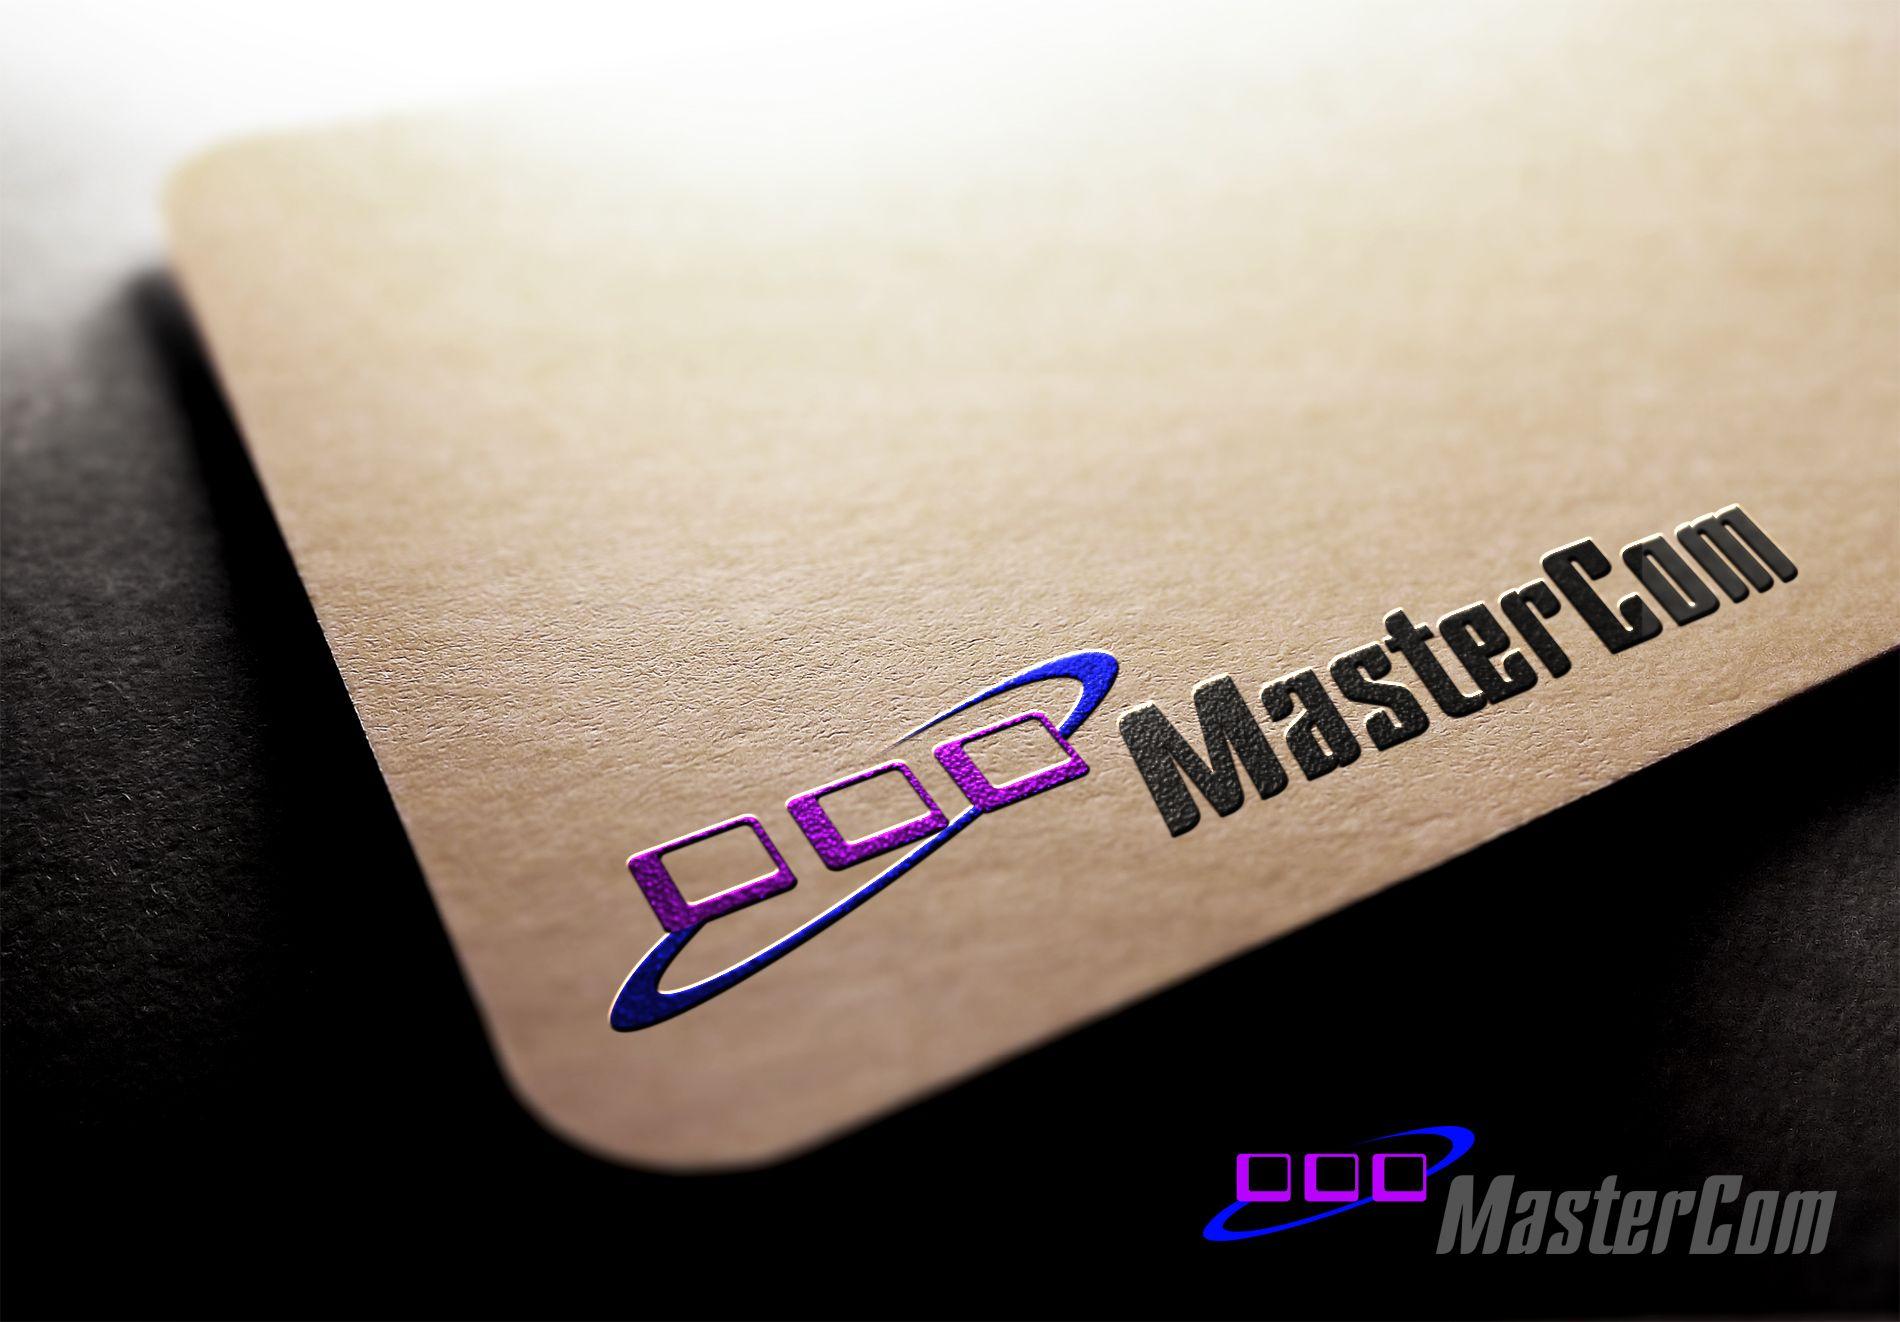 MasterCom (логотип, фирменный стиль) - дизайнер La_persona